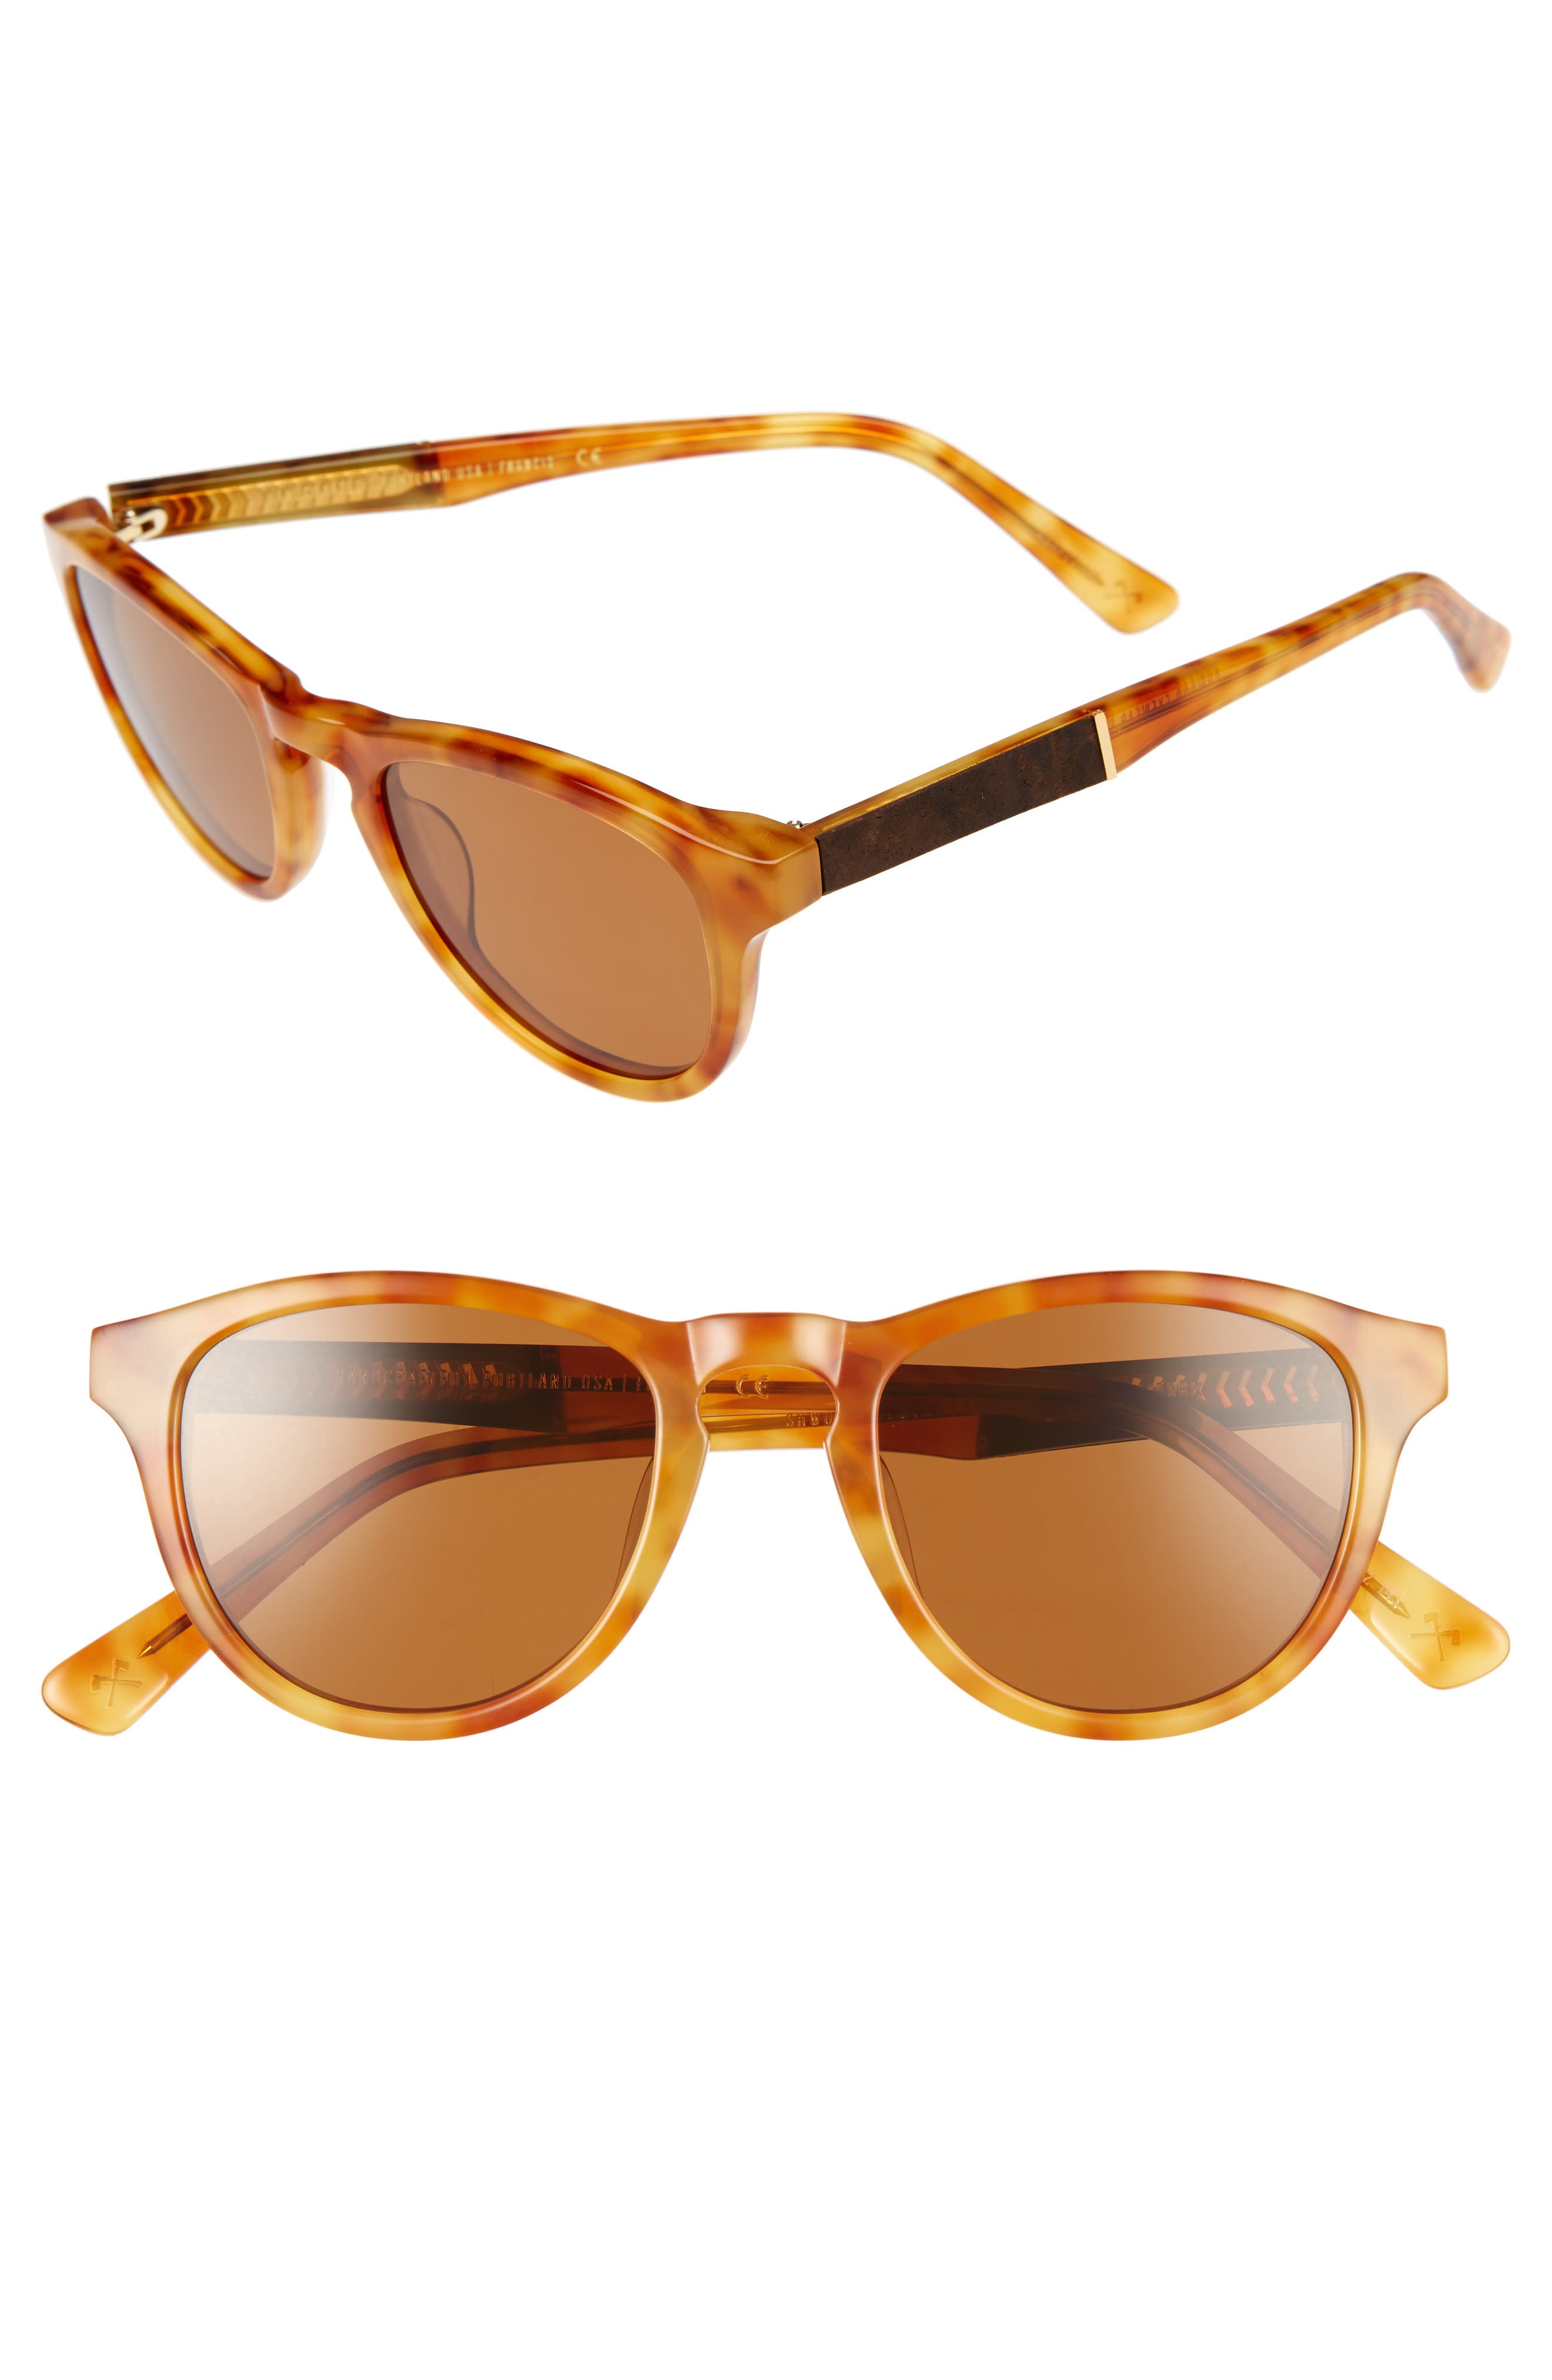 Ace 48mm Sunglasses,                         Main,                         color, Amber/ Elm/ Brown Polar